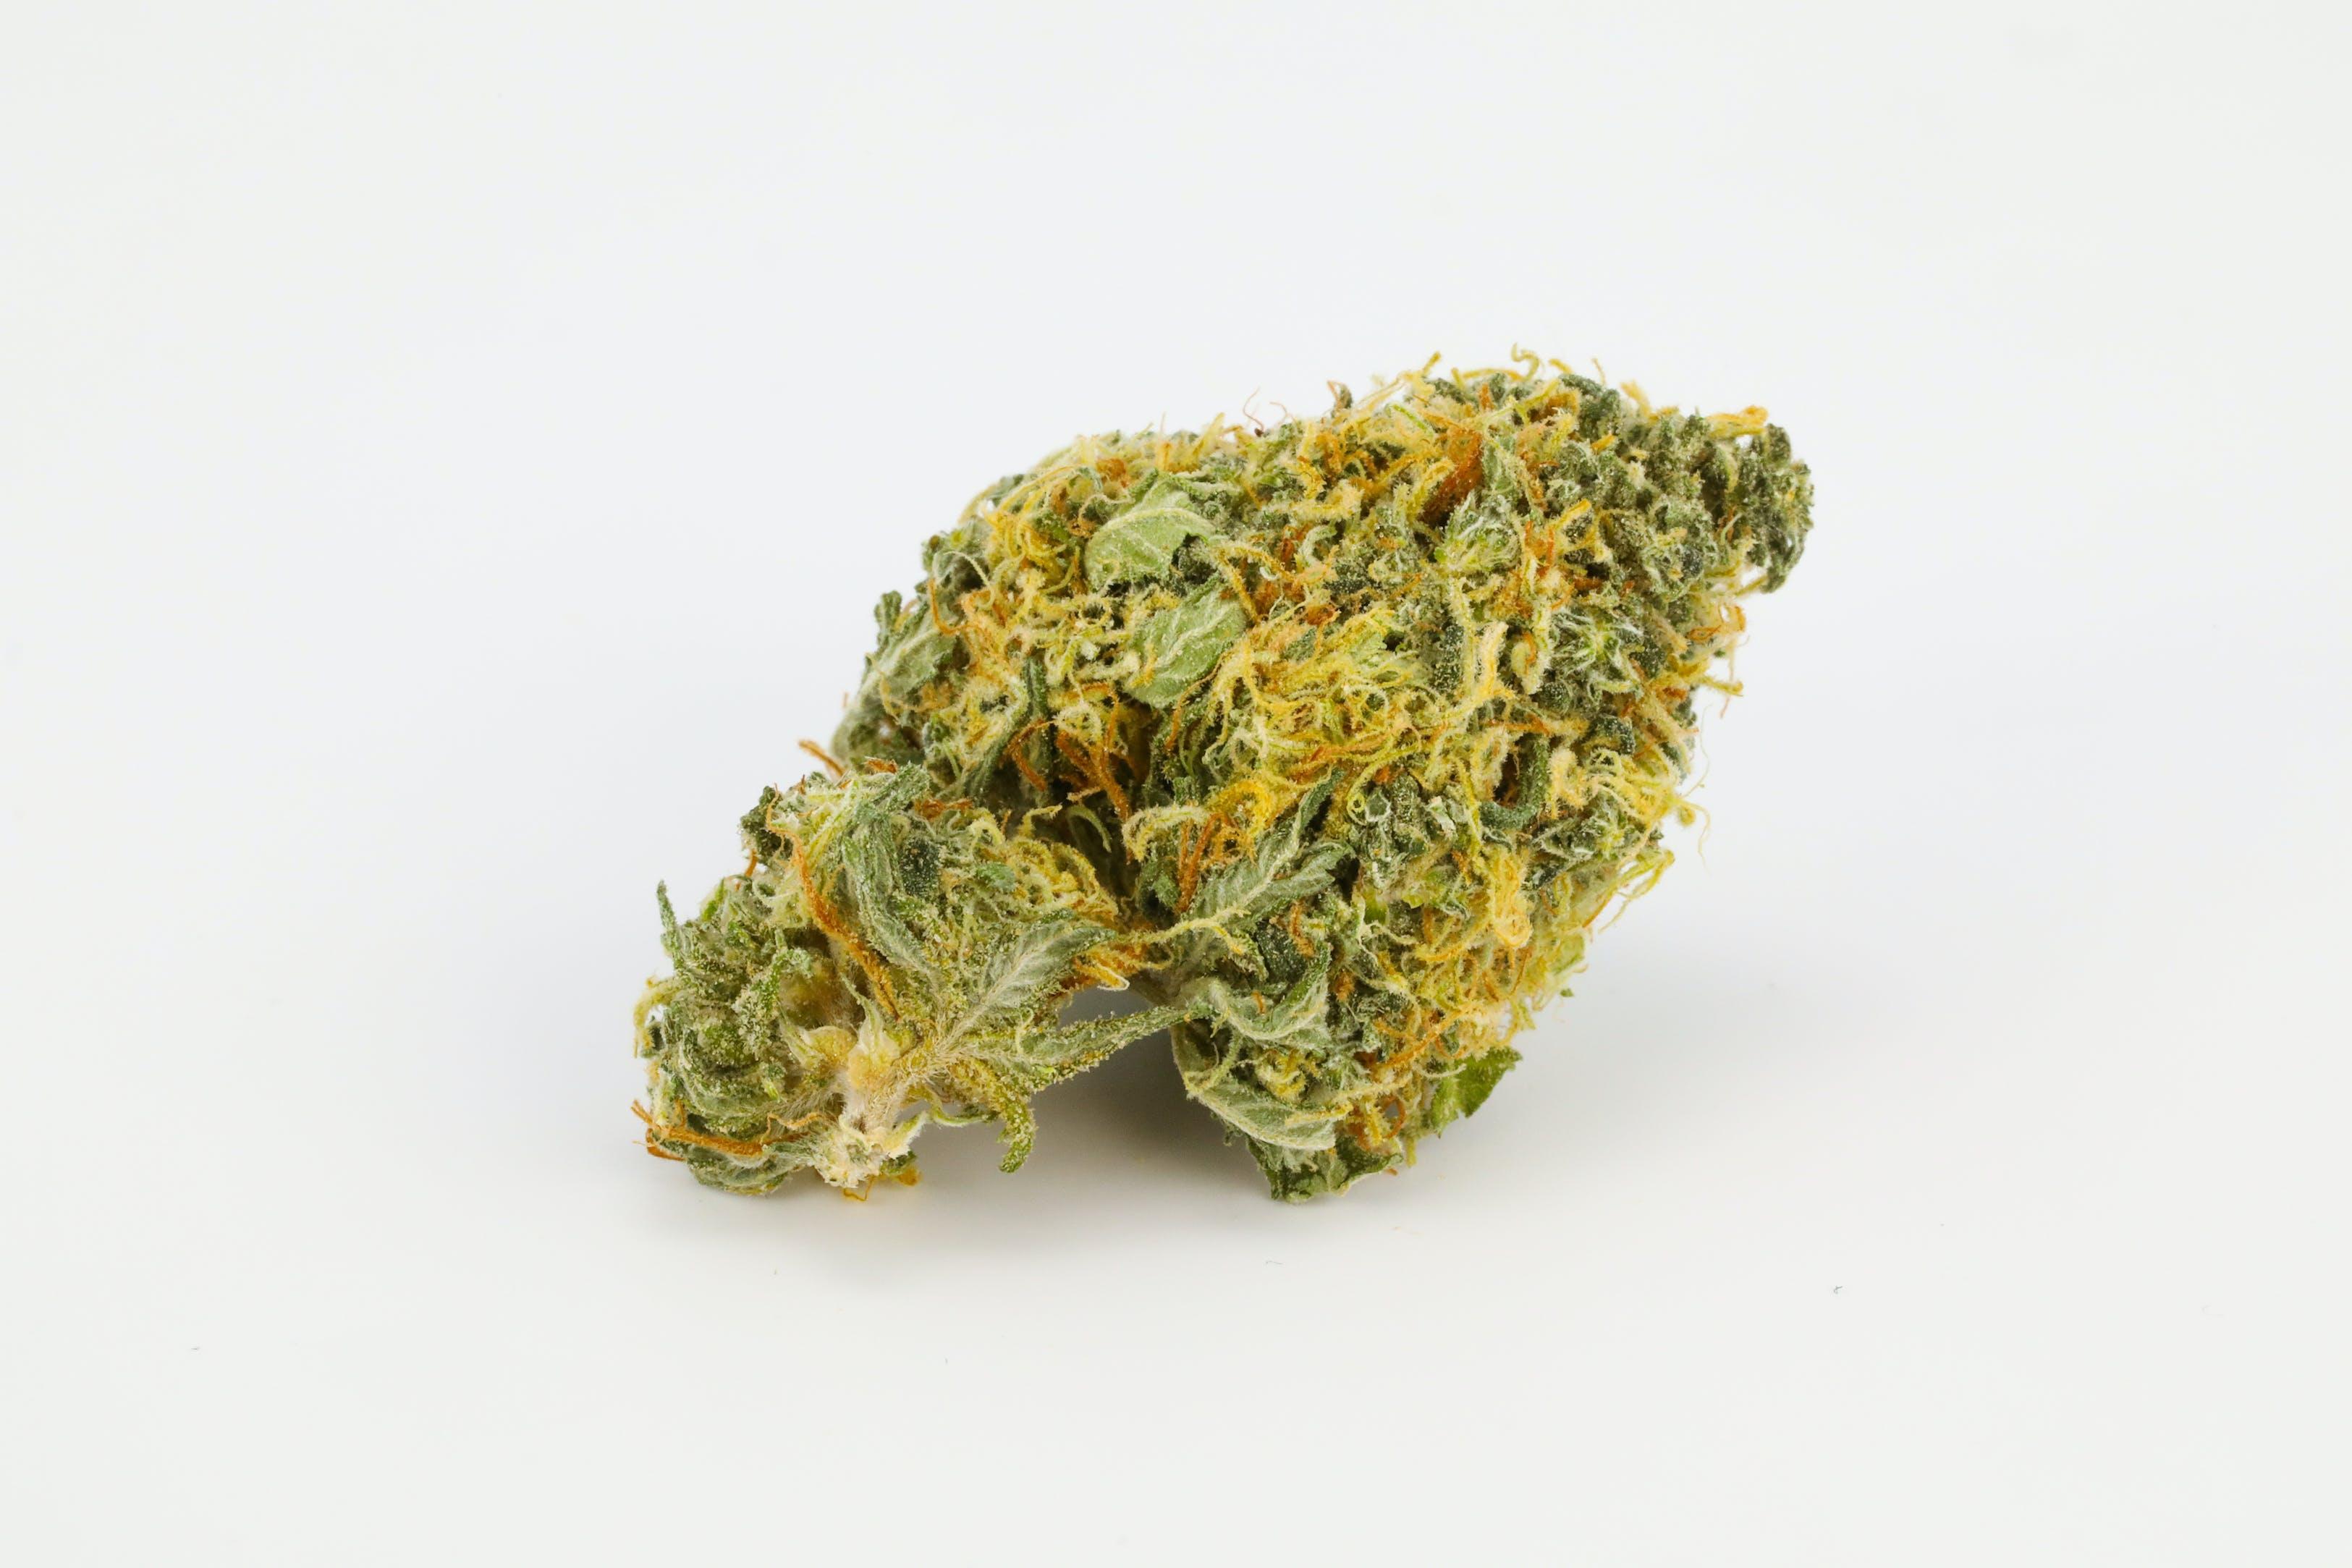 Marionberry Kush weed; Marionberry Kush Cannabis Strain; Marionberry Kush Hybrid Marijuana Strain